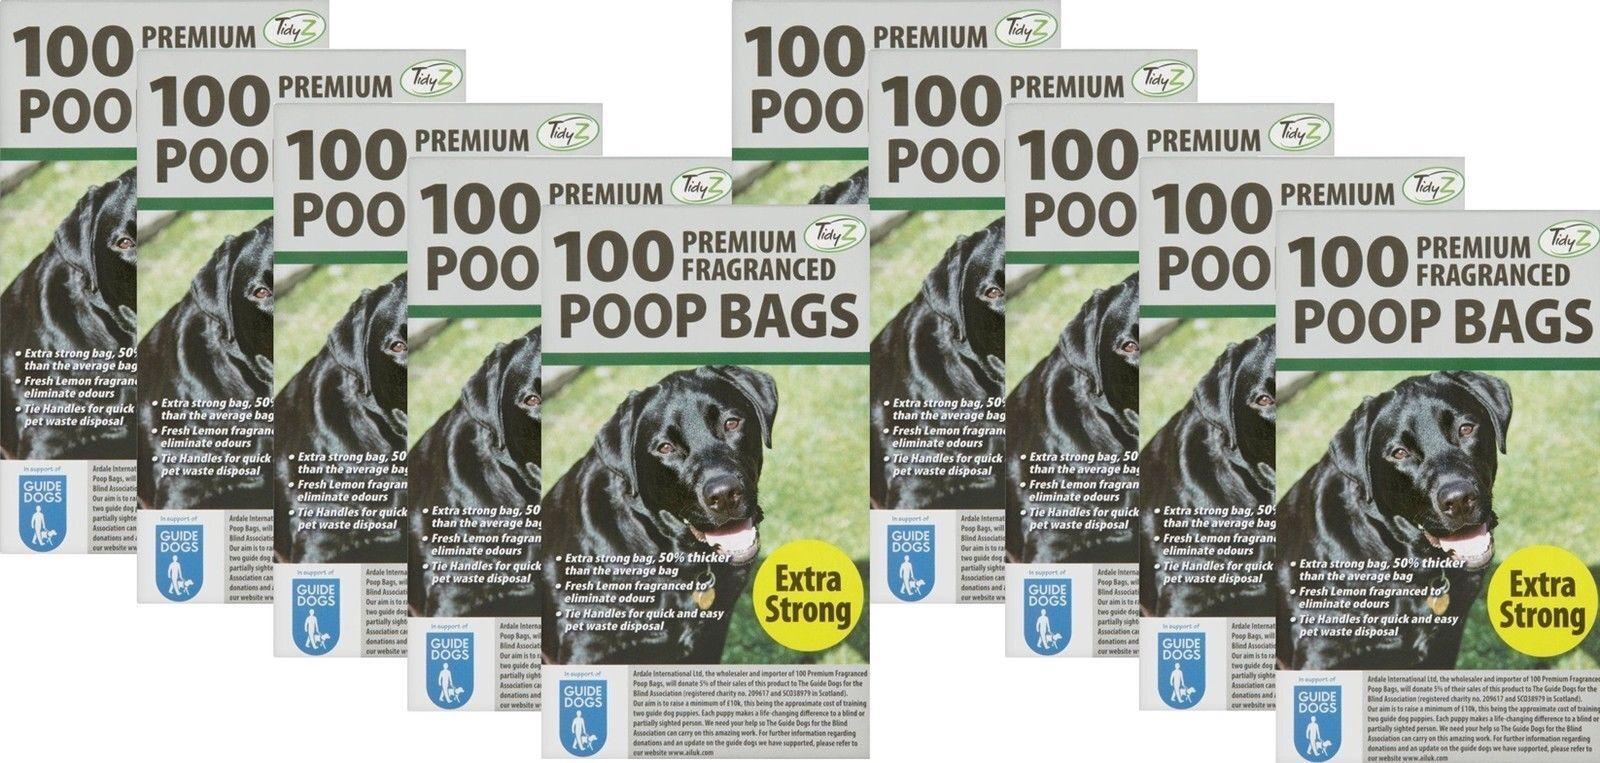 7200 DOGGY BAGS PROFUMATA EXTRA FORTE CANE GATTO Poo rifiuti WC pet bag FRAGRANZA